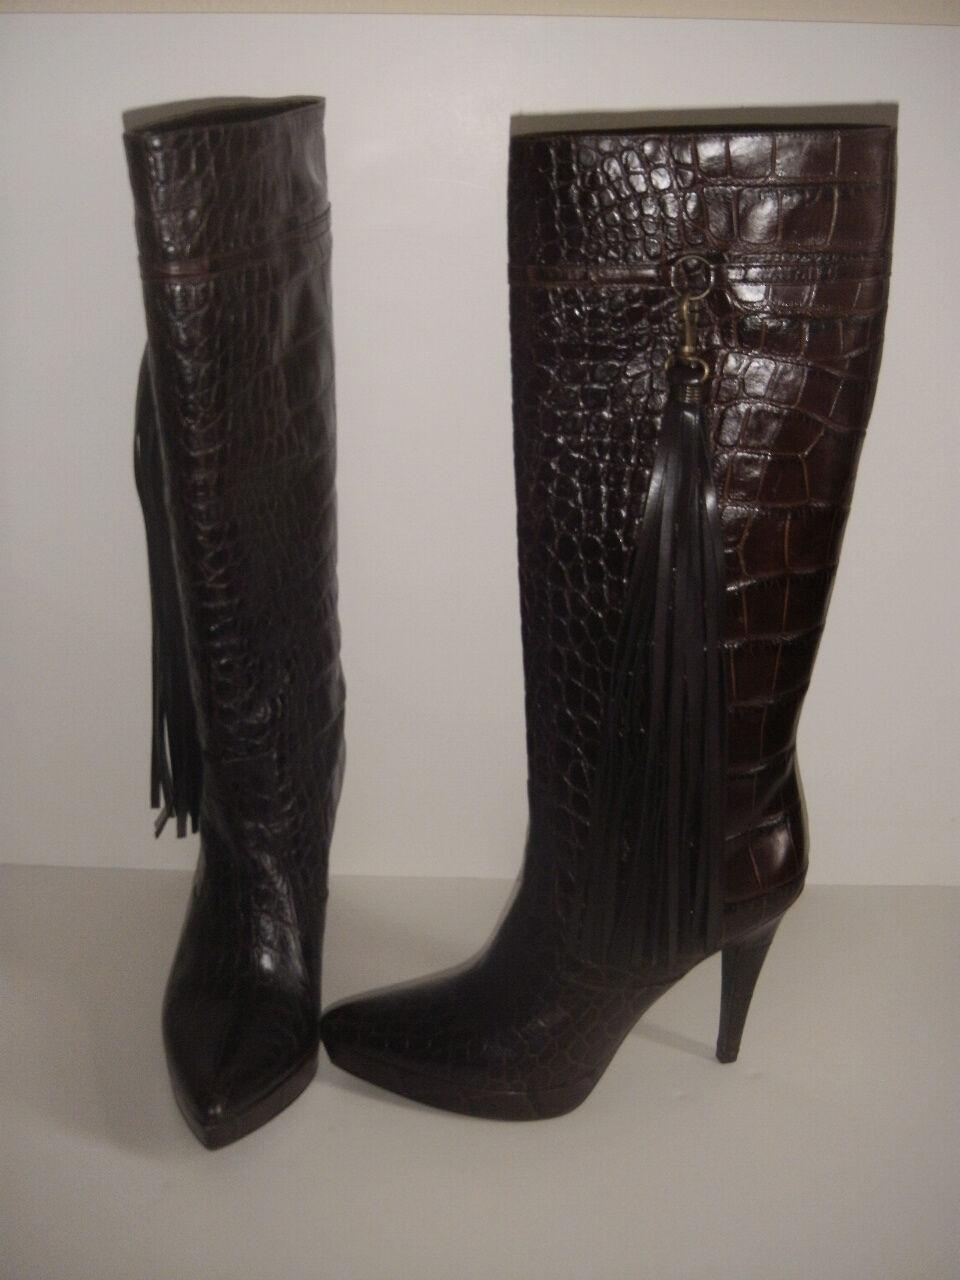 Charles David crocodlie botas botas botas Con Borlas a morir por Talle 8.5 nos debe hasta  ventas en linea